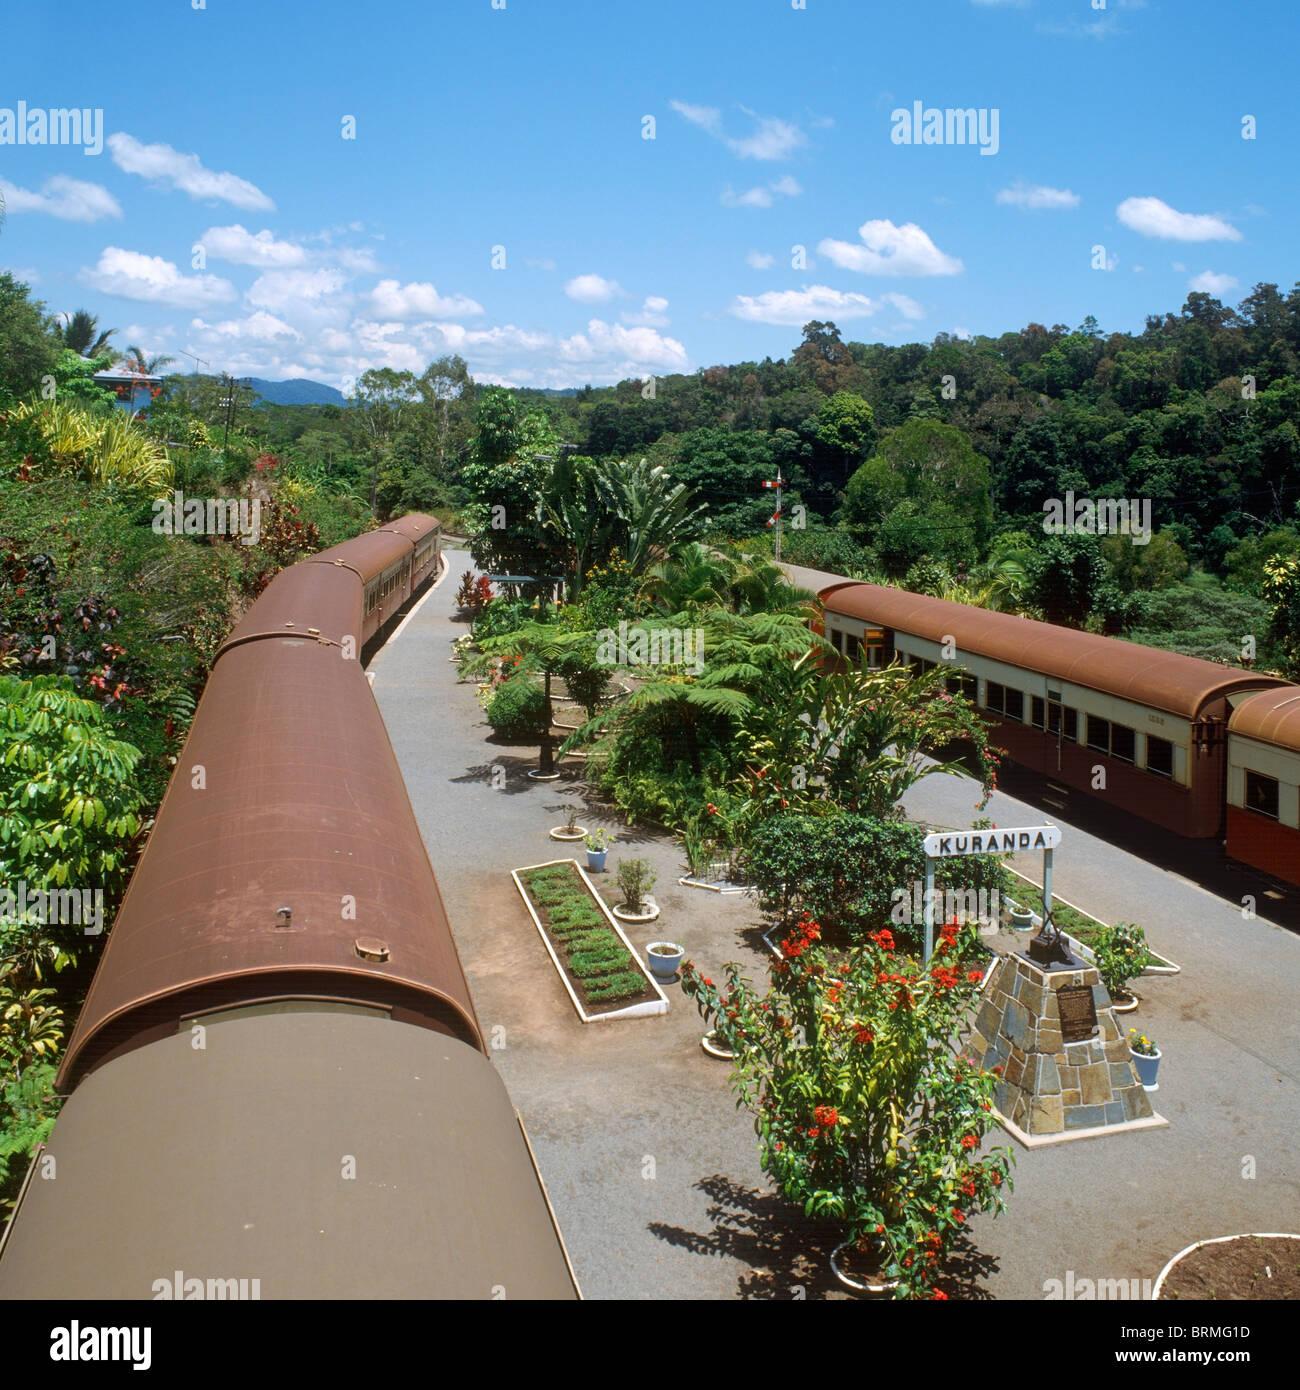 Trains in the station in Kuranda, Atherton Tablelands, North Queensland, Australia - Stock Image